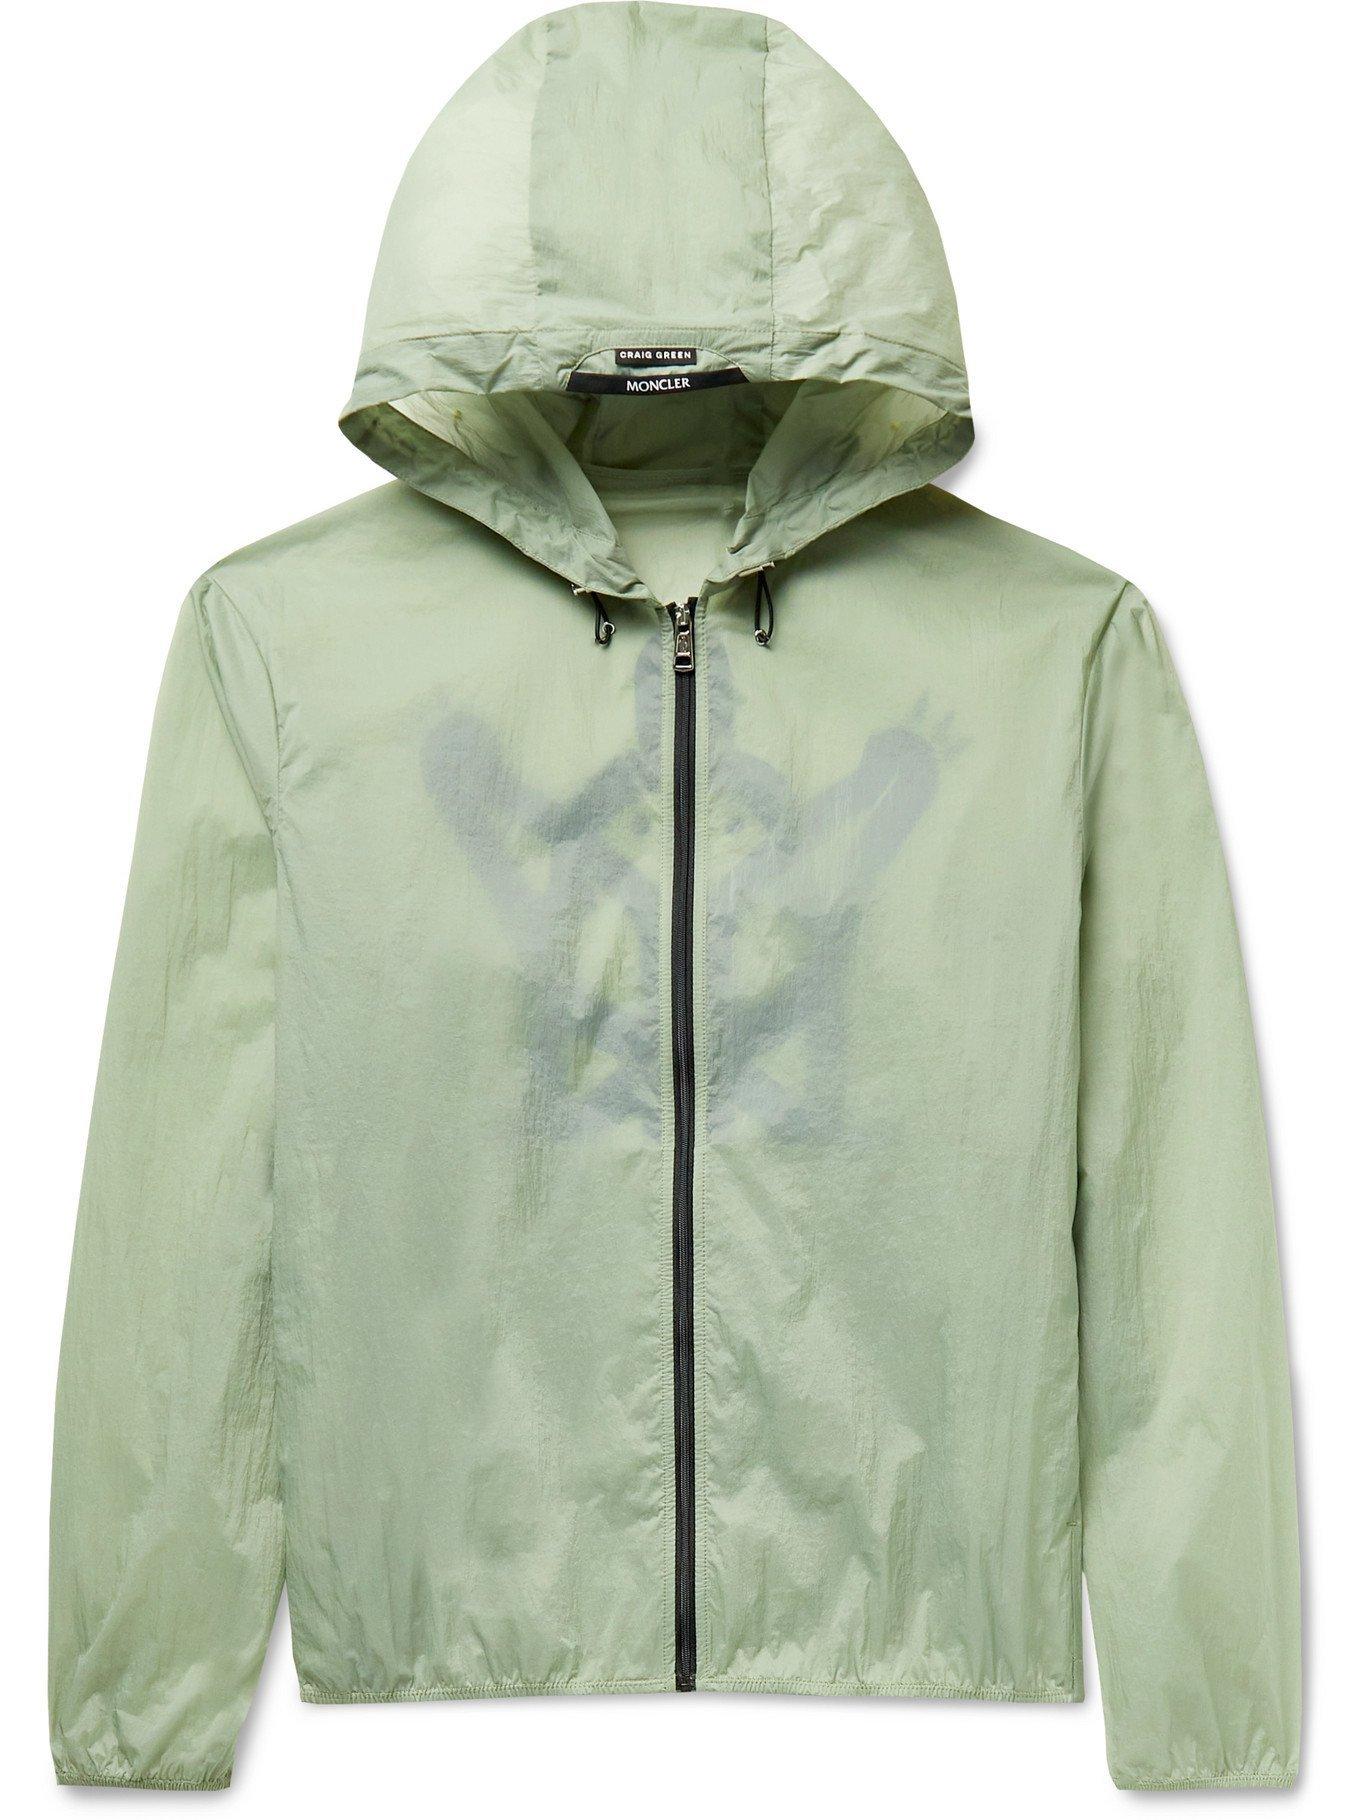 Photo: MONCLER GENIUS - 5 Moncler Craig Green Oxybelis Printed Nylon Hooded Jacket - Green